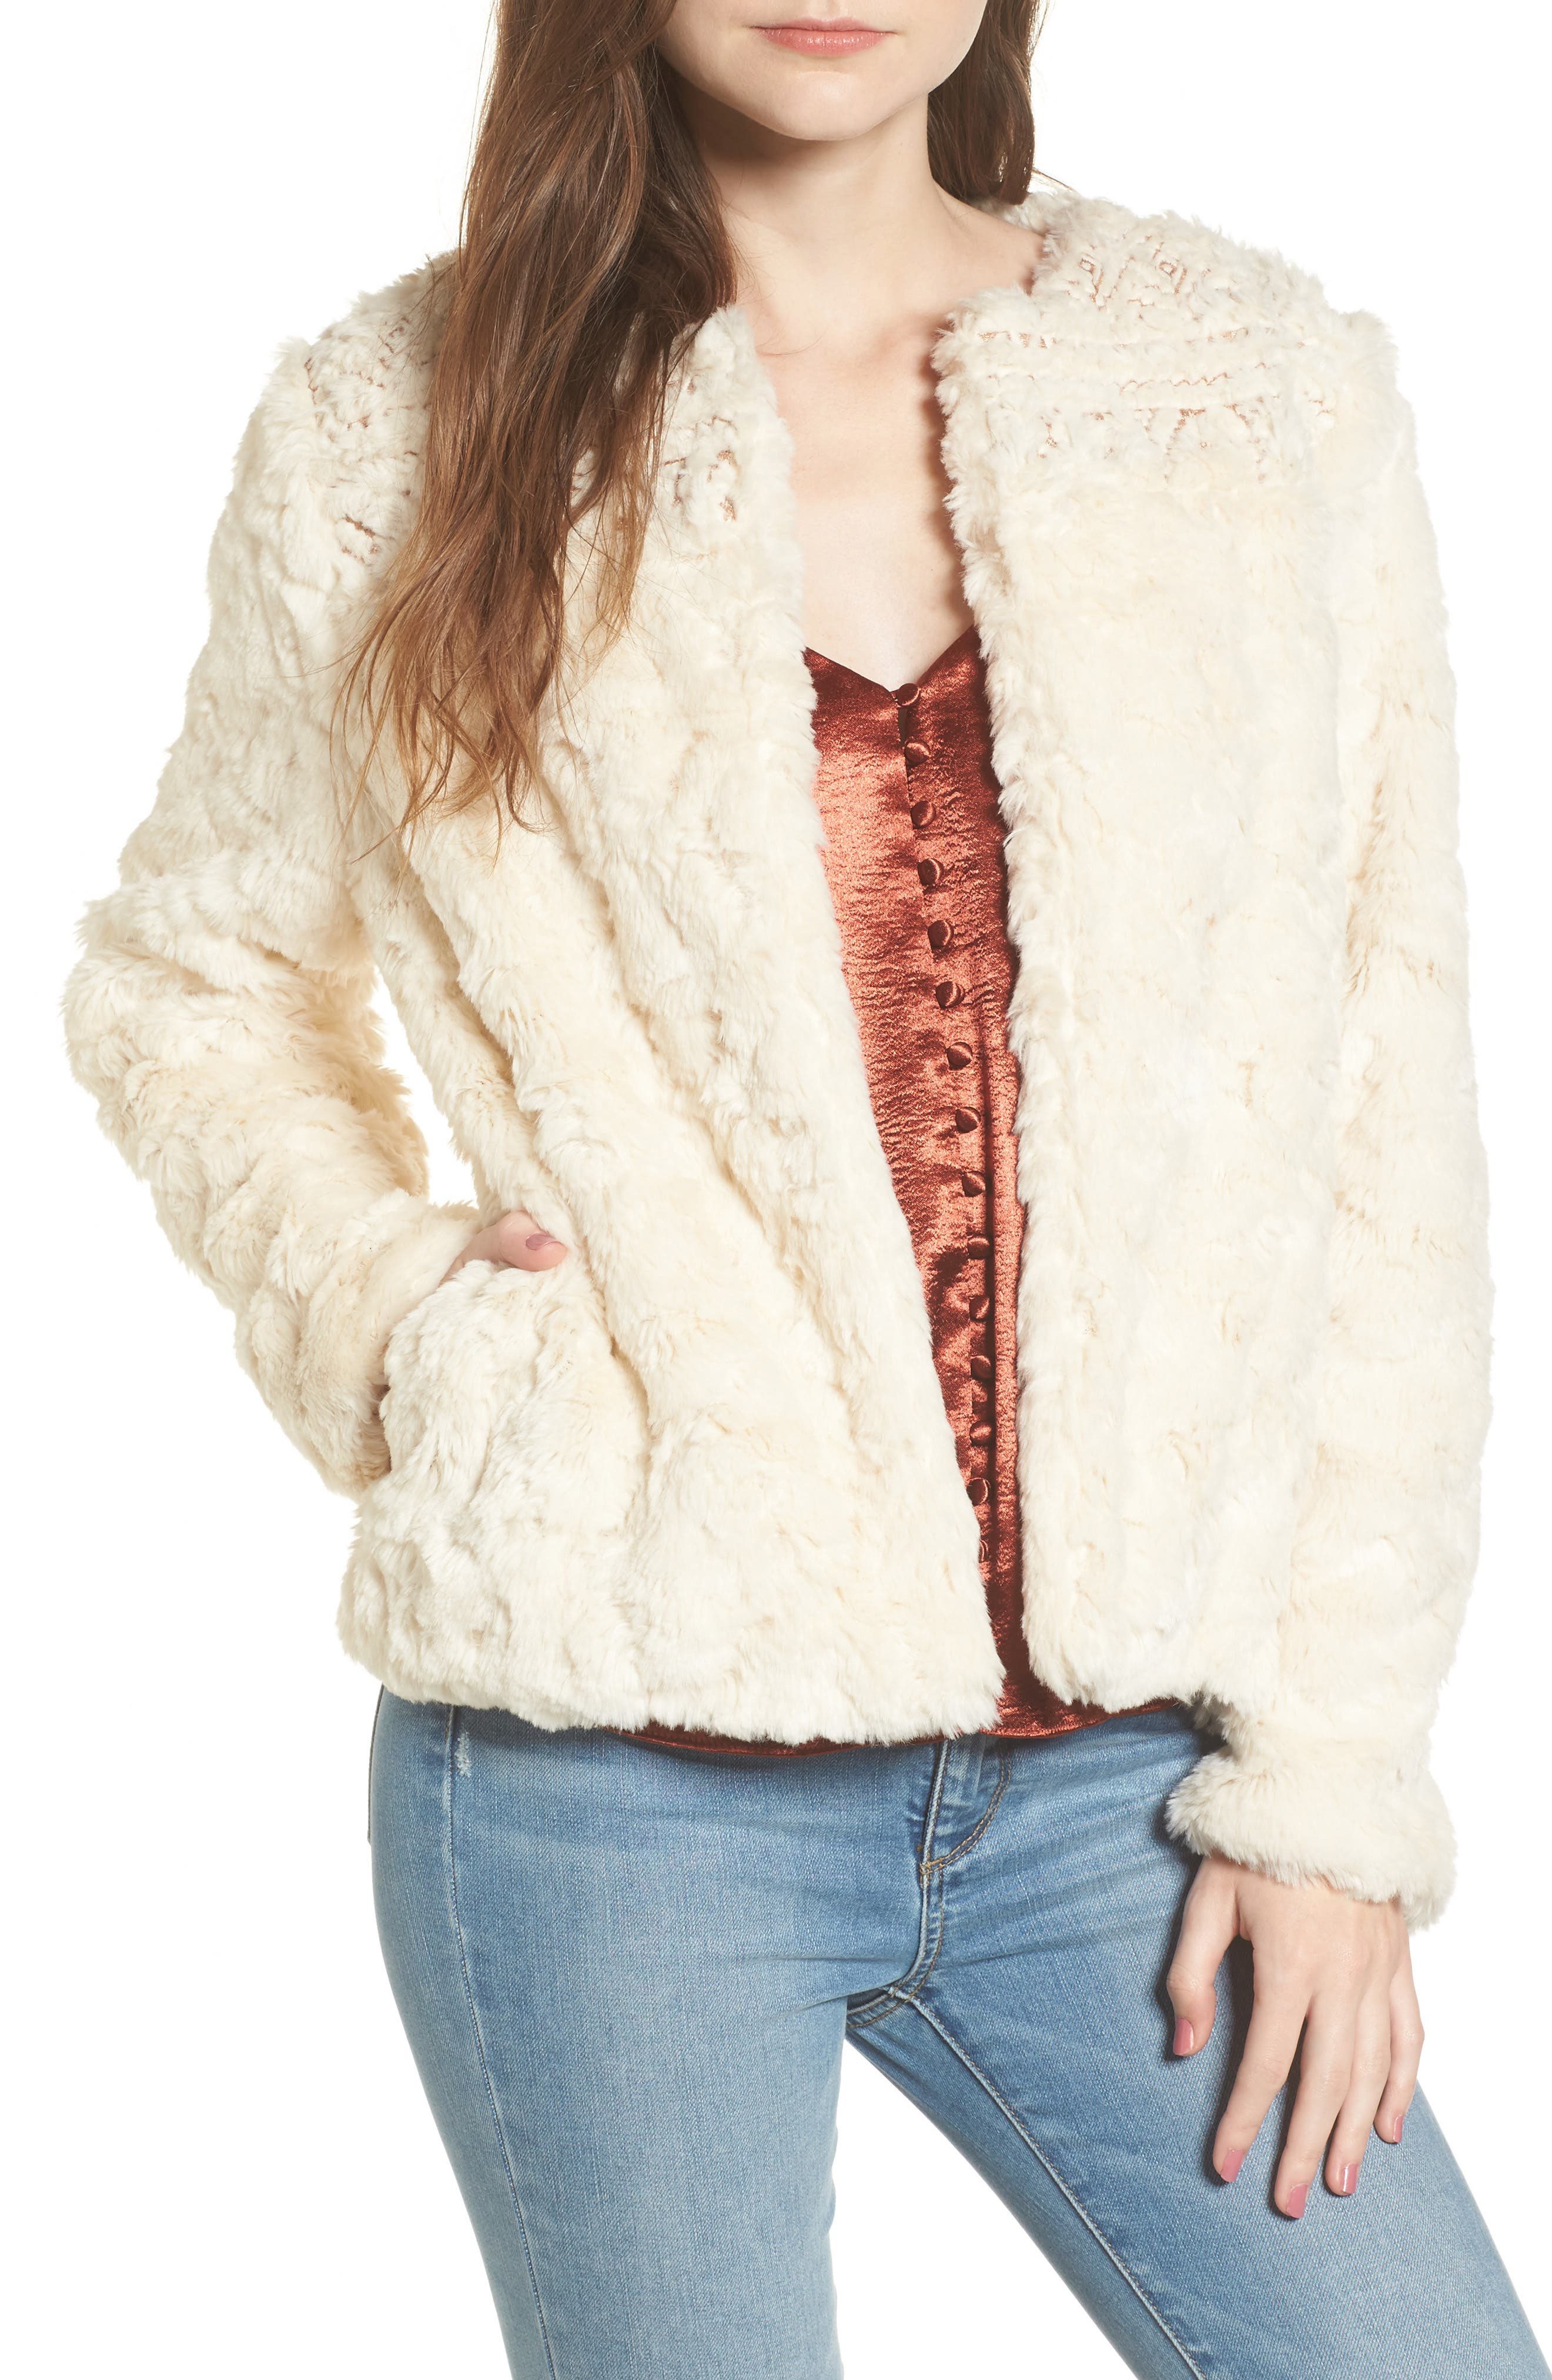 Lost + Wander Metallic Embroidery Faux Fur Jacket